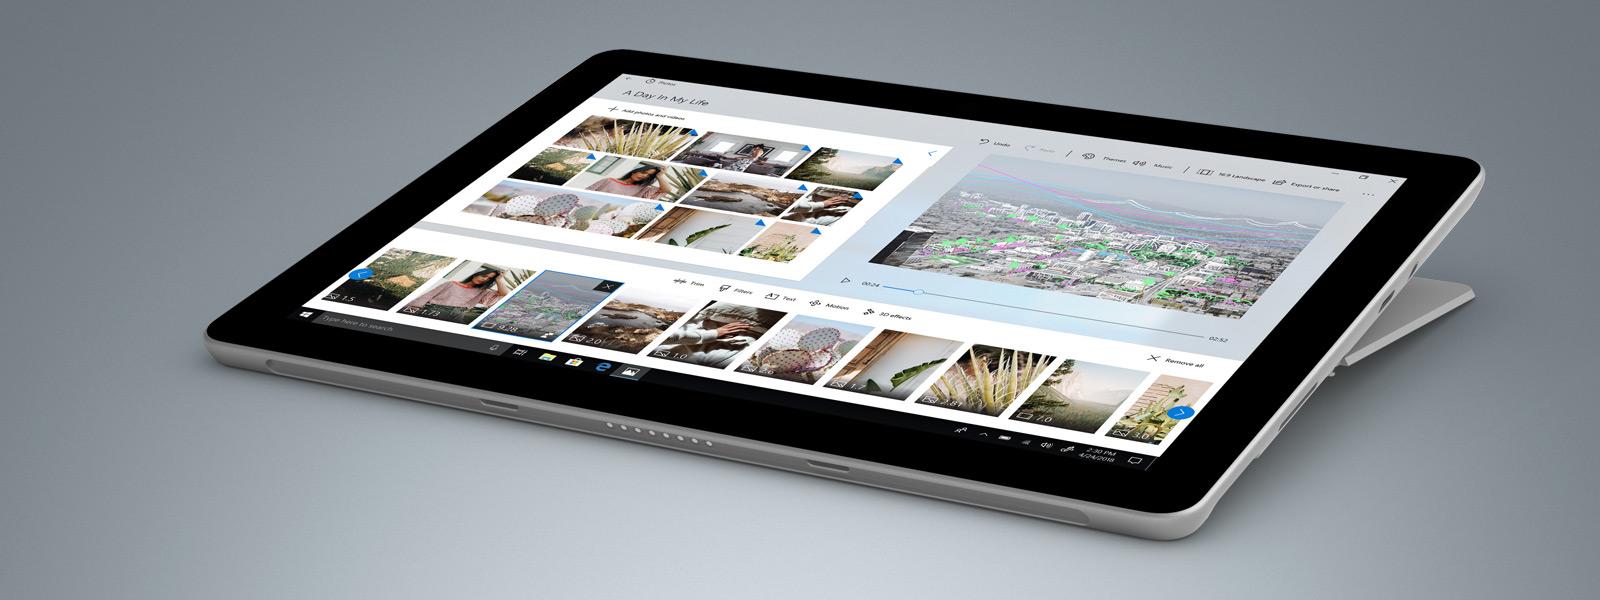 Surface Go 與相片應用程式